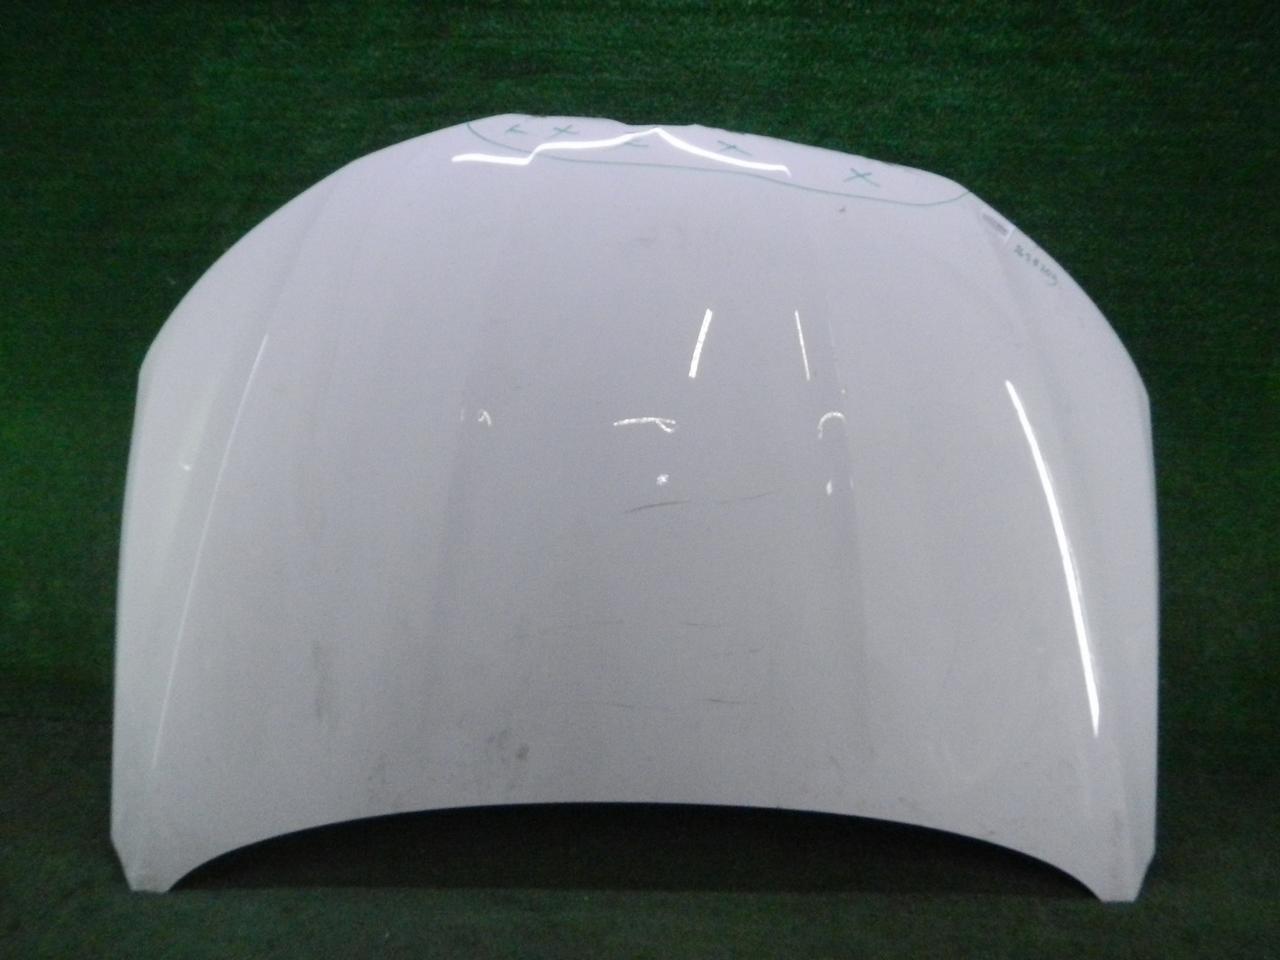 Капот Renault Arkana (2019-н.в.) 651009338R